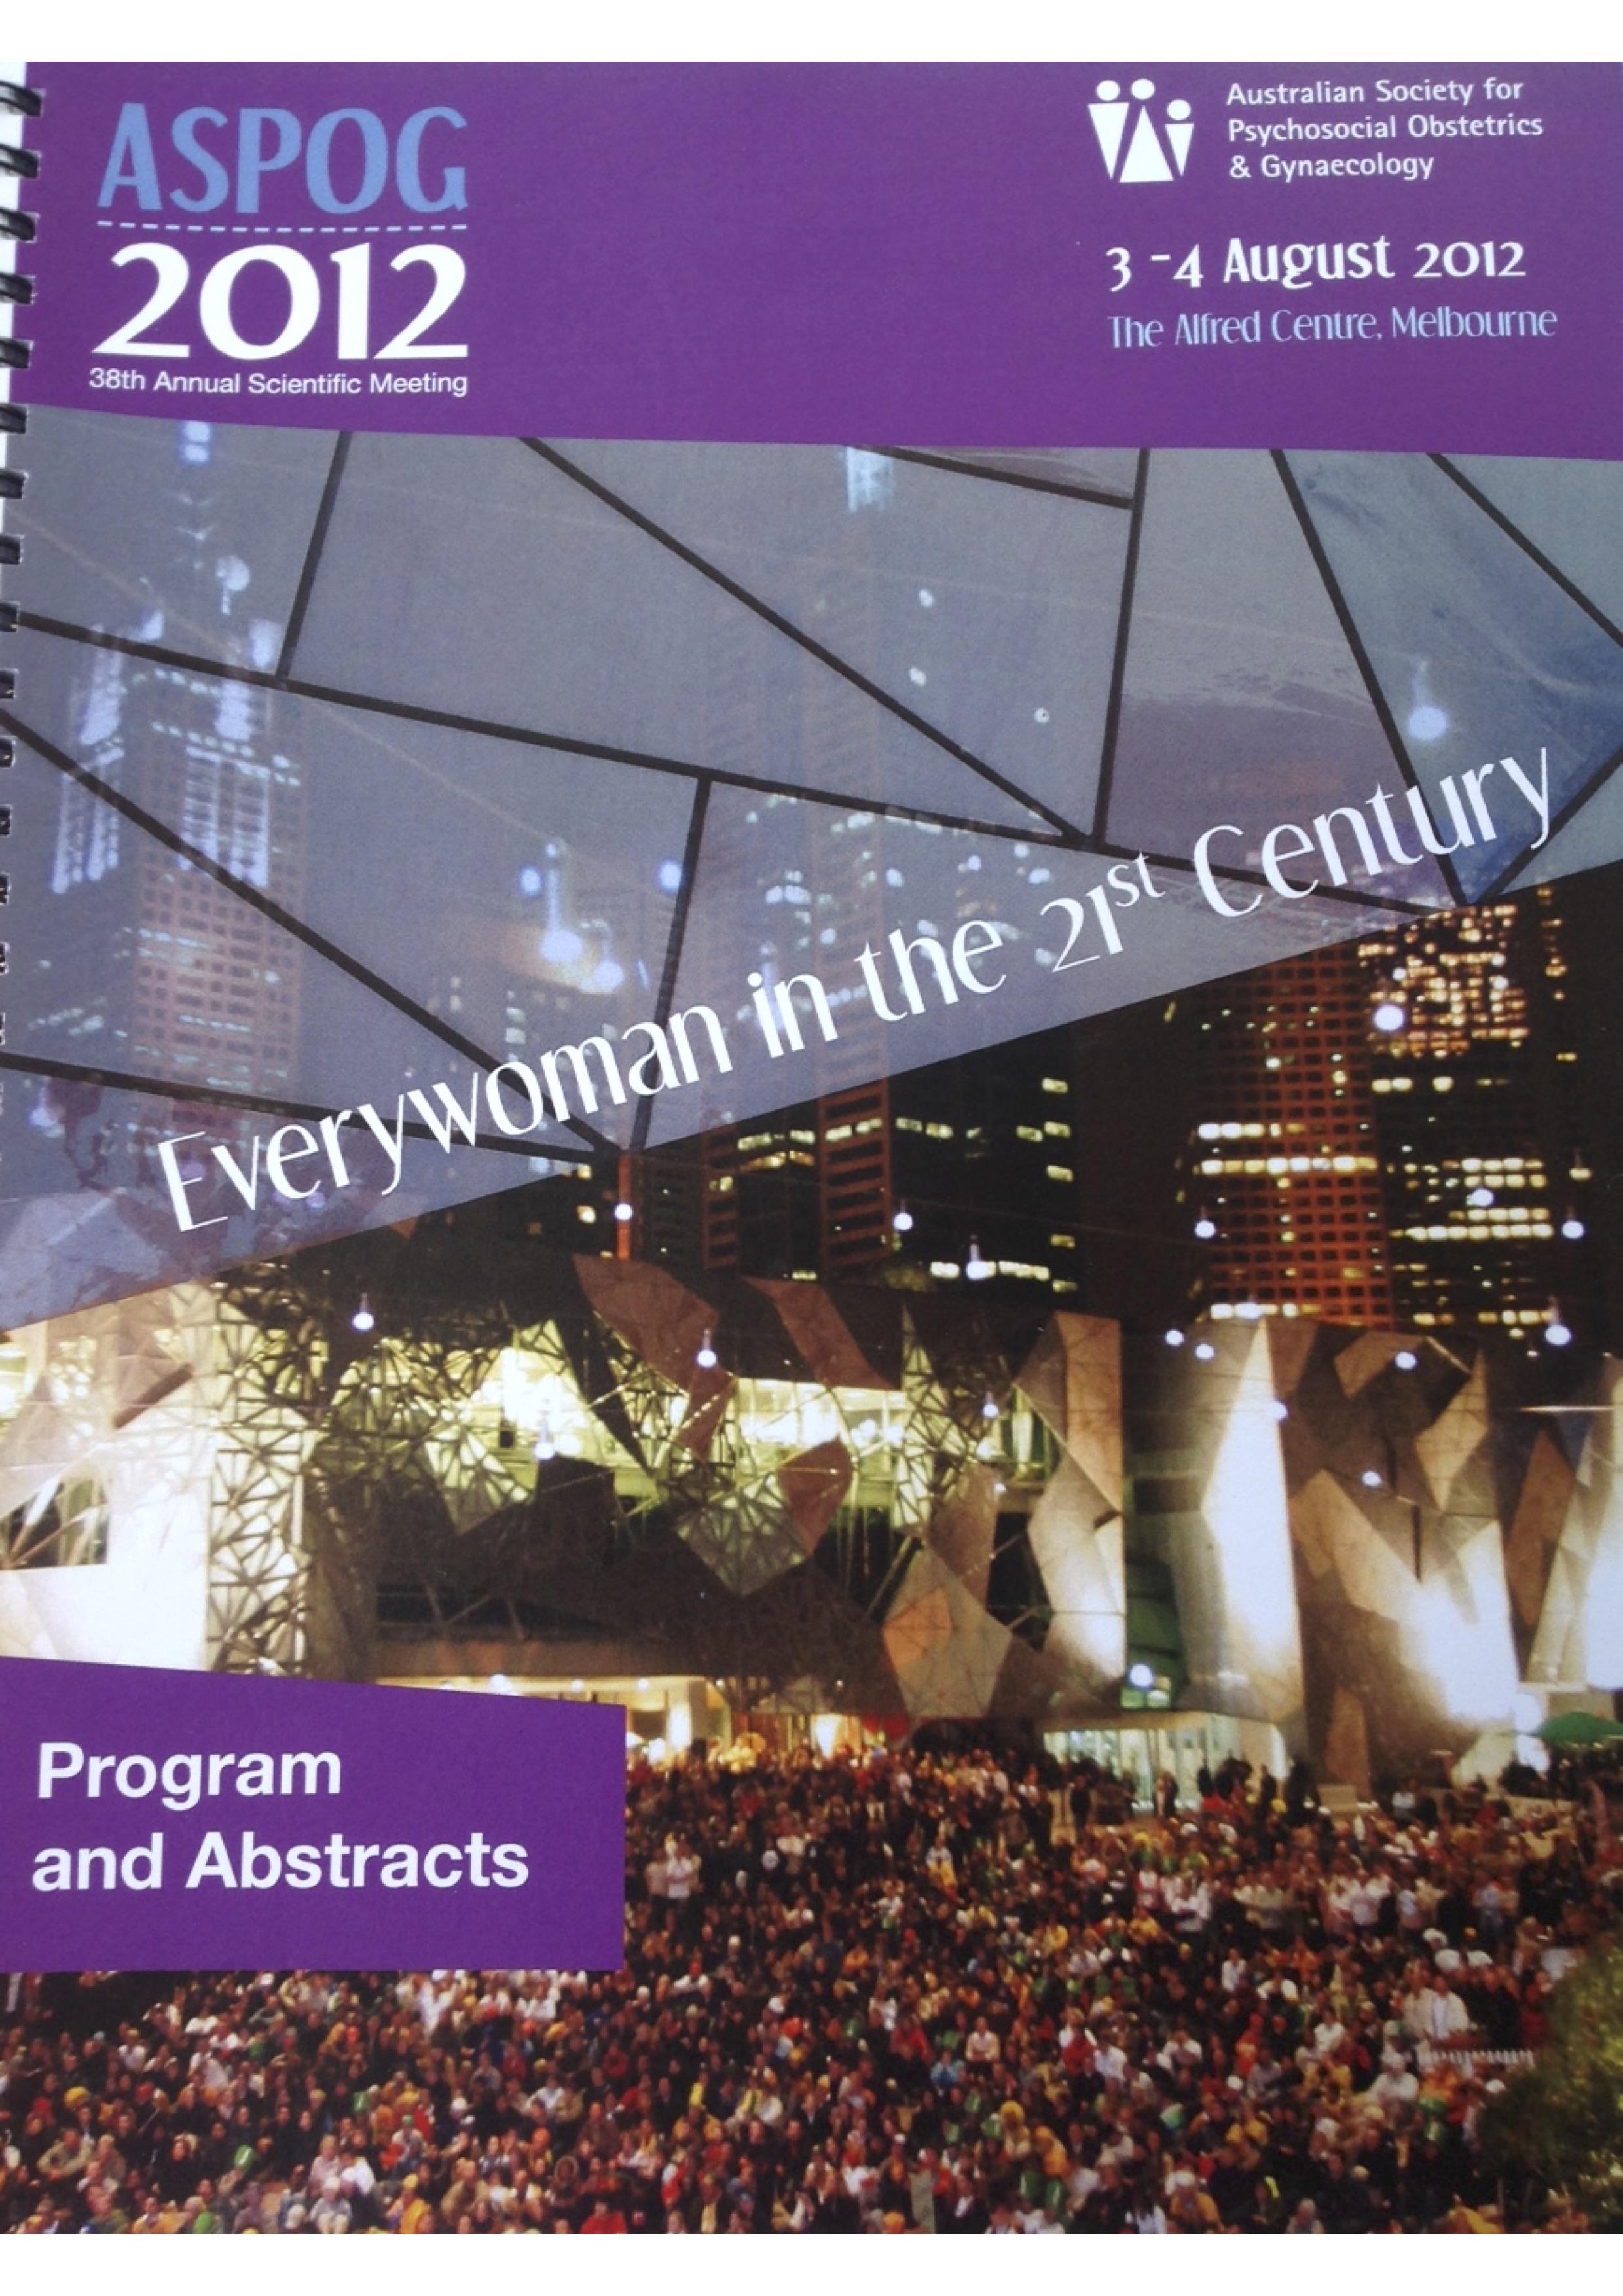 ASPOG 38th Annual Scientific Meeting 2012 - Everywoman in the 21st Century